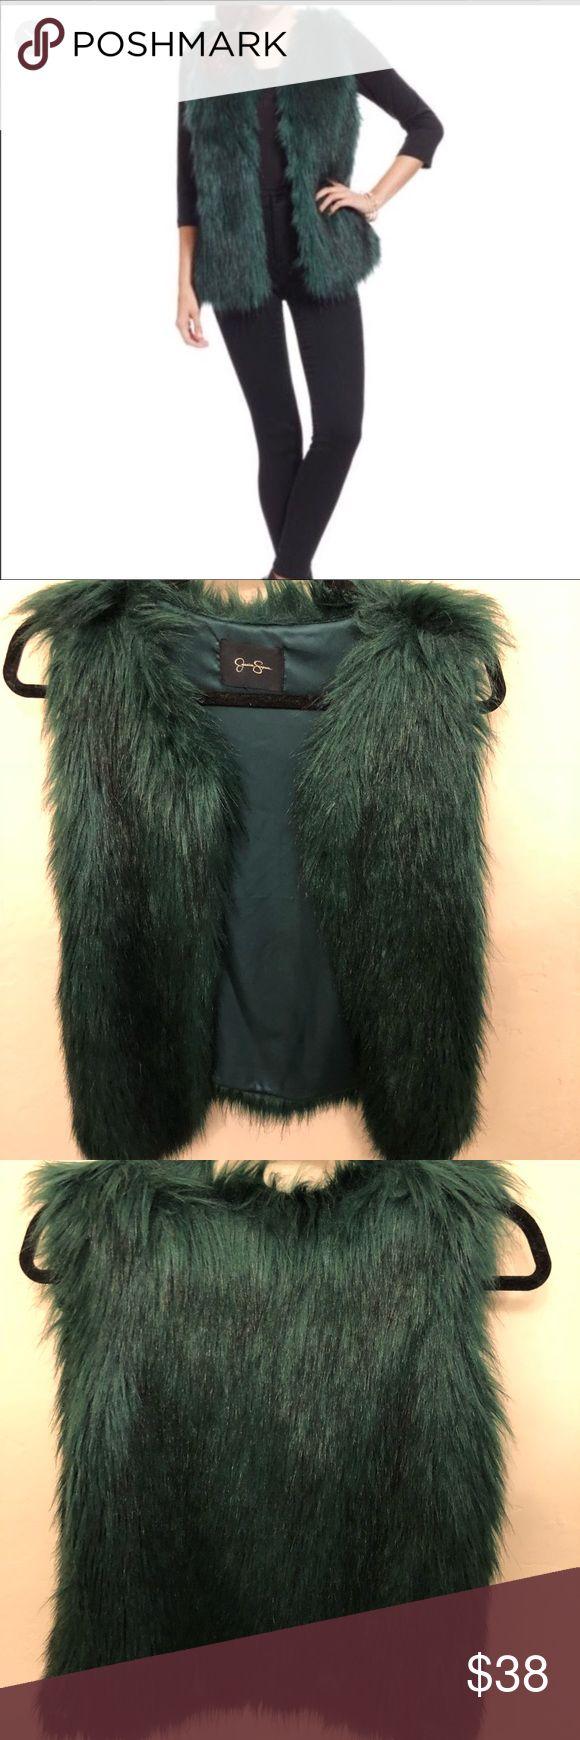 Jessica Simpson faux fur vest Emerald green Jessica Simpson faux fur vest! Excellent condition worn only once Jessica Simpson Jackets & Coats Vests